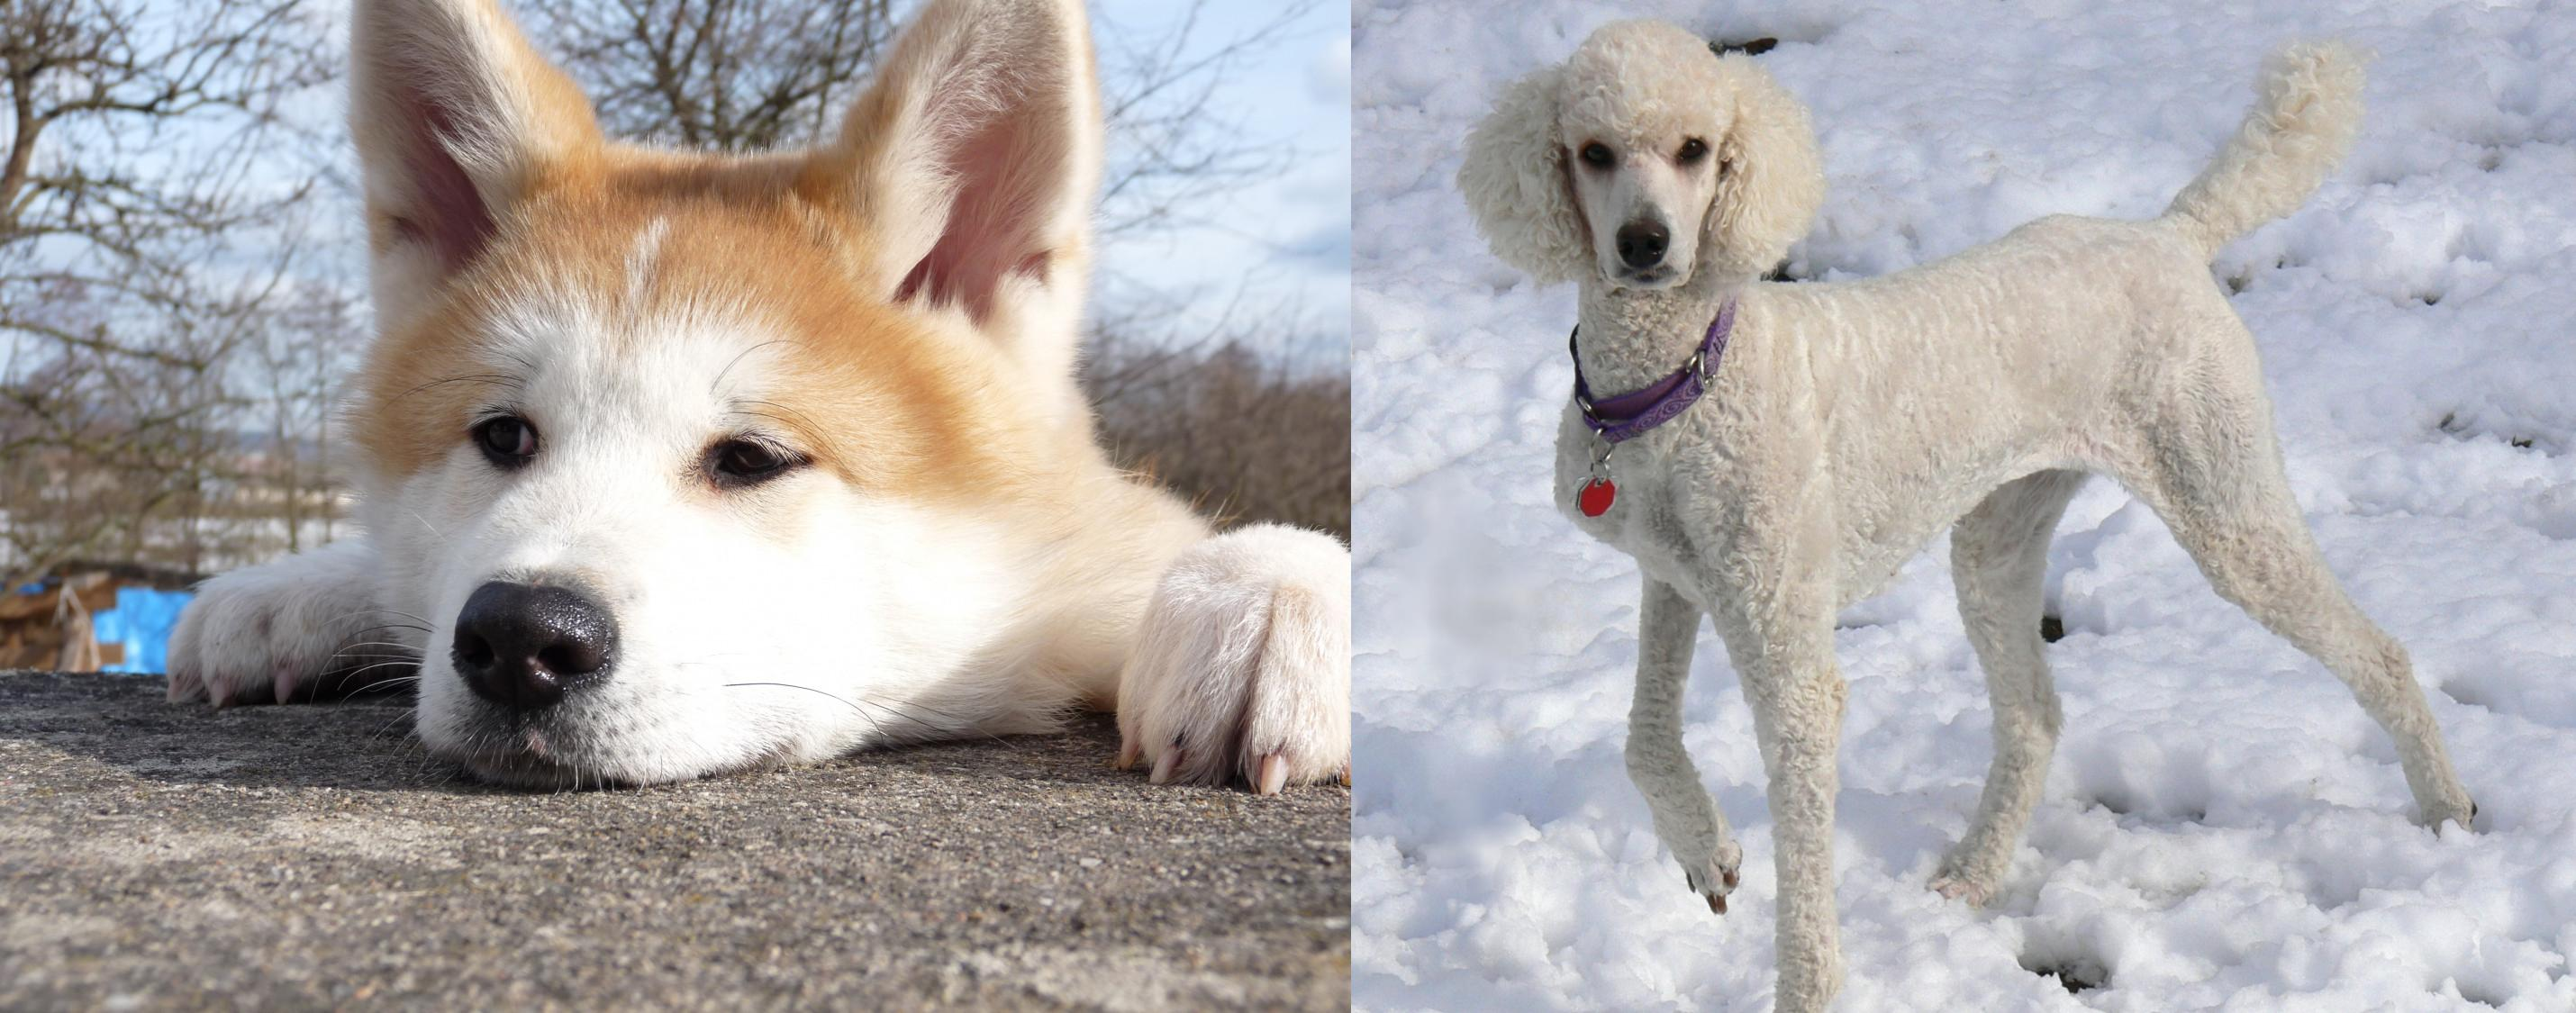 Akita Vs Poodle Breed Comparison Mydogbreeds